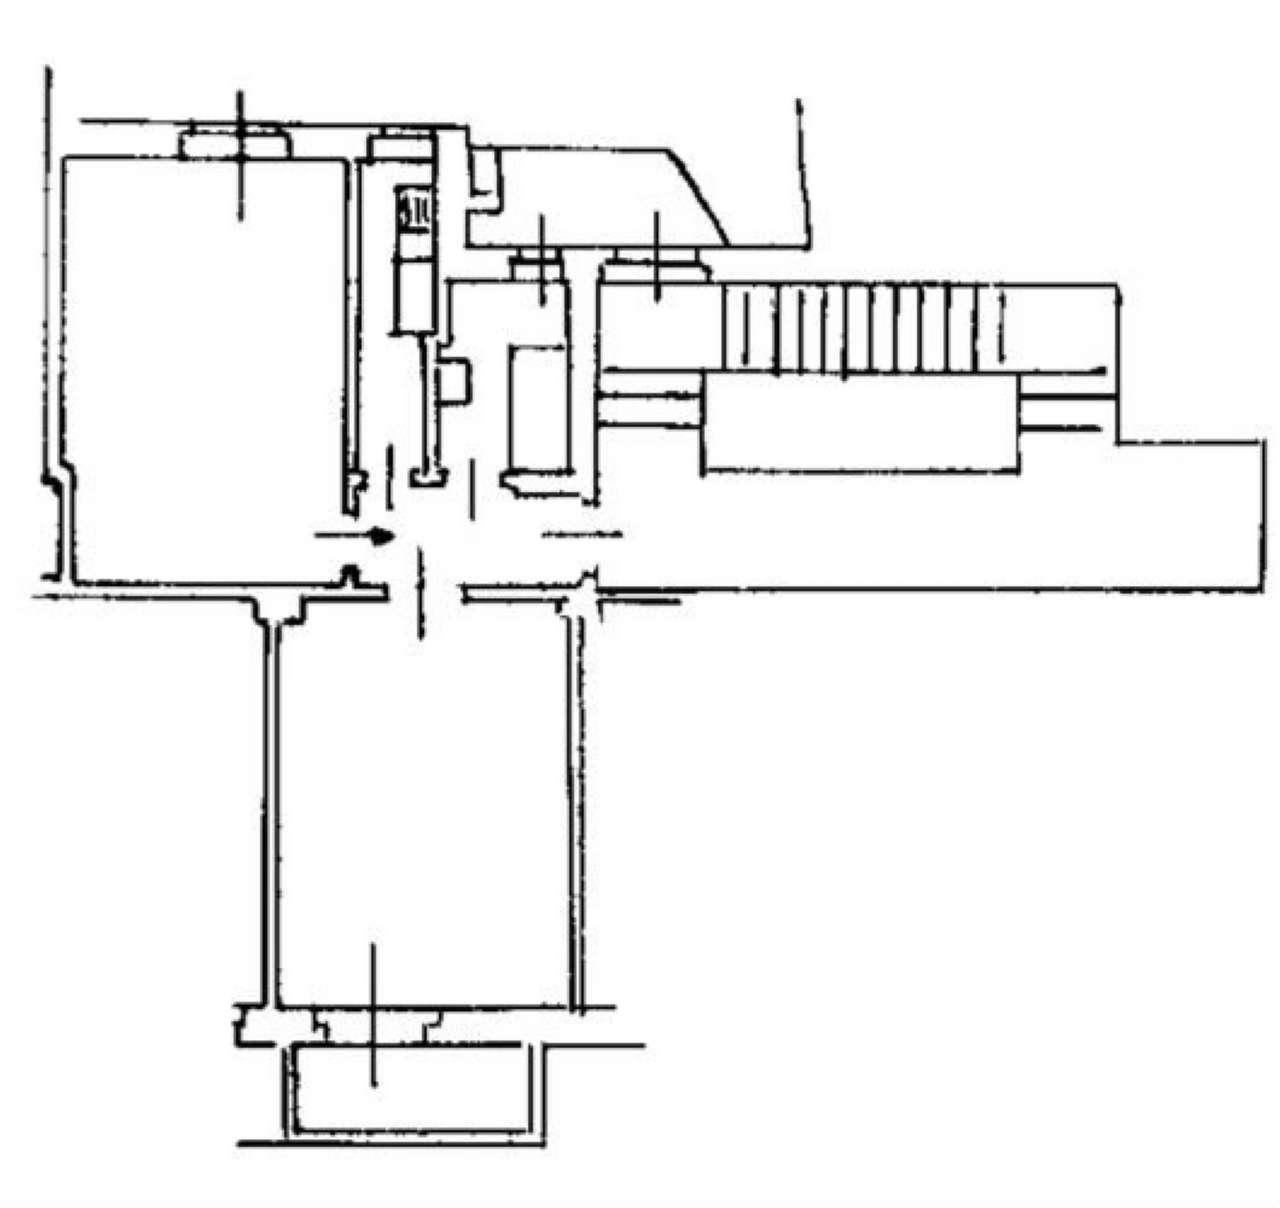 Vendita  bilocale Paderno Dugnano Via Tripoli 1 1433896